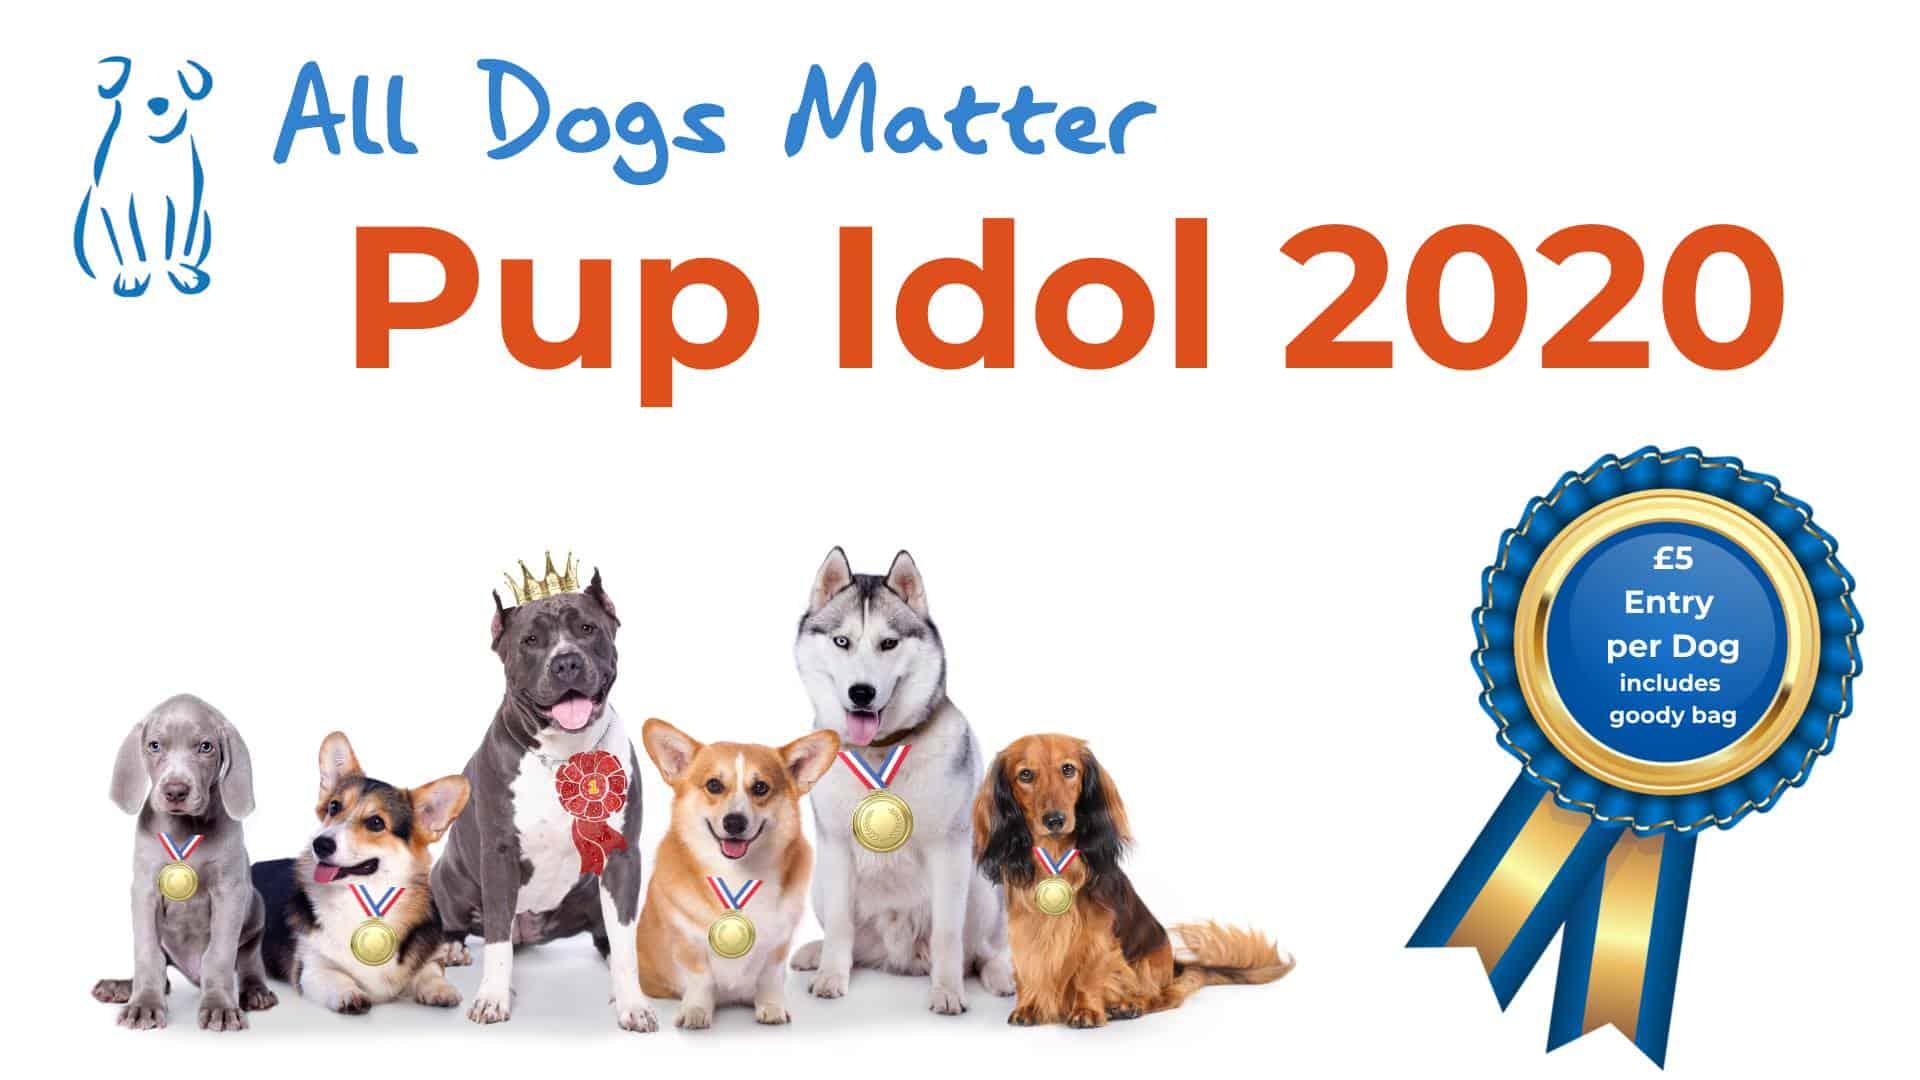 All Dogs Matter Pup Idol 2020